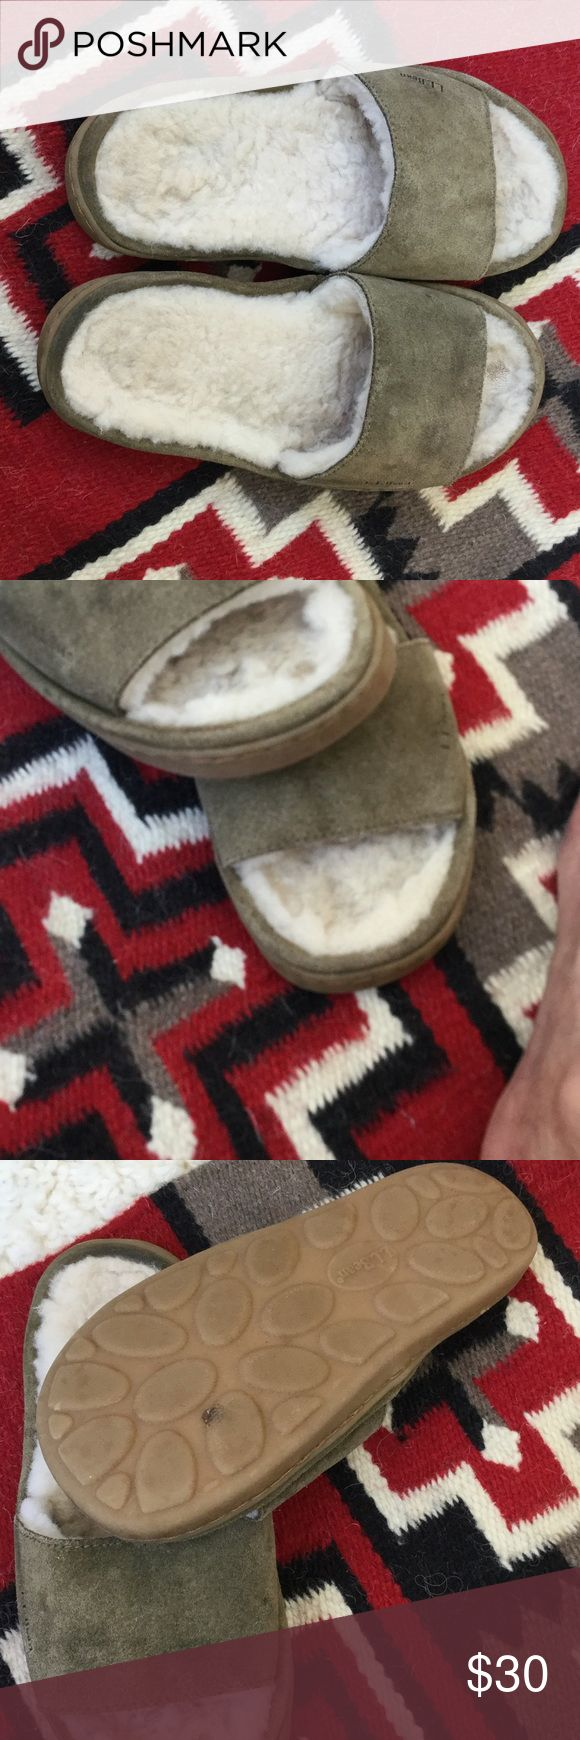 LLBean sheepskin shearling slippers 8 Dusty army green suede with genuine sheepskin interior. Bit of wear in great toe area, see photo. Rubber soles. No other wear. llbean Shoes Slippers